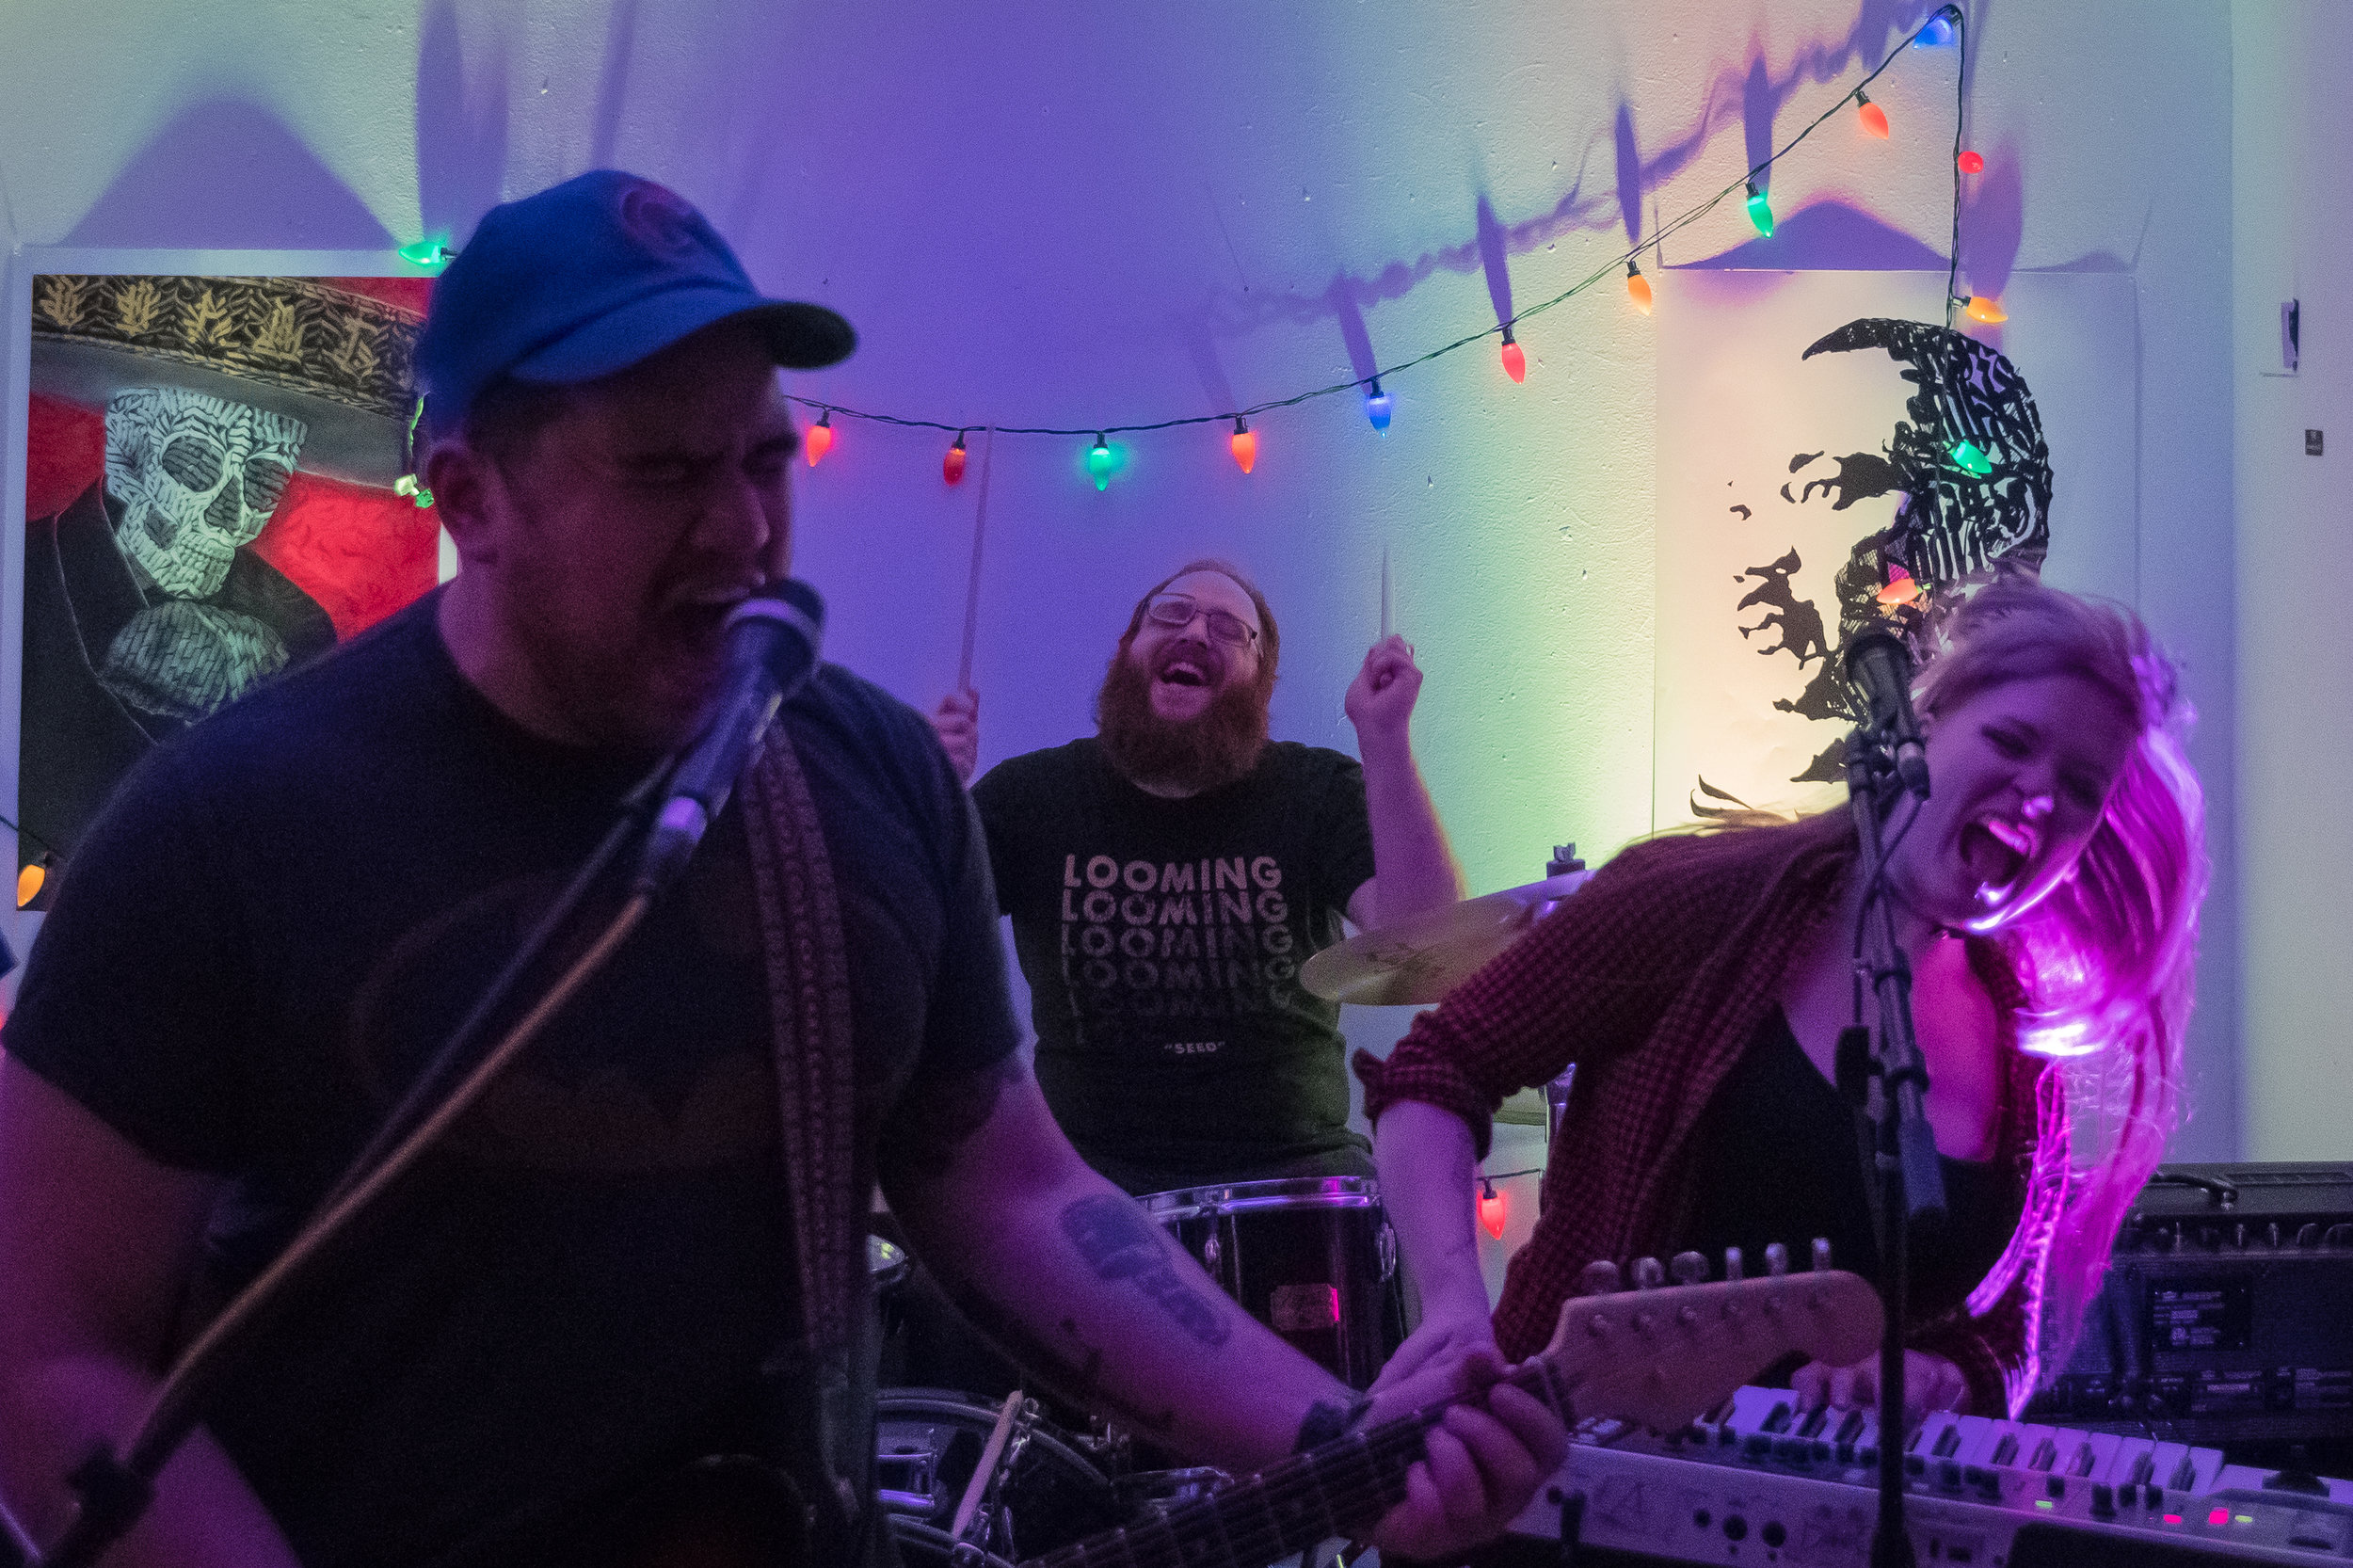 Camp/us, Chicago, IL, March 2018.  Photo Credit: Brobi Photo